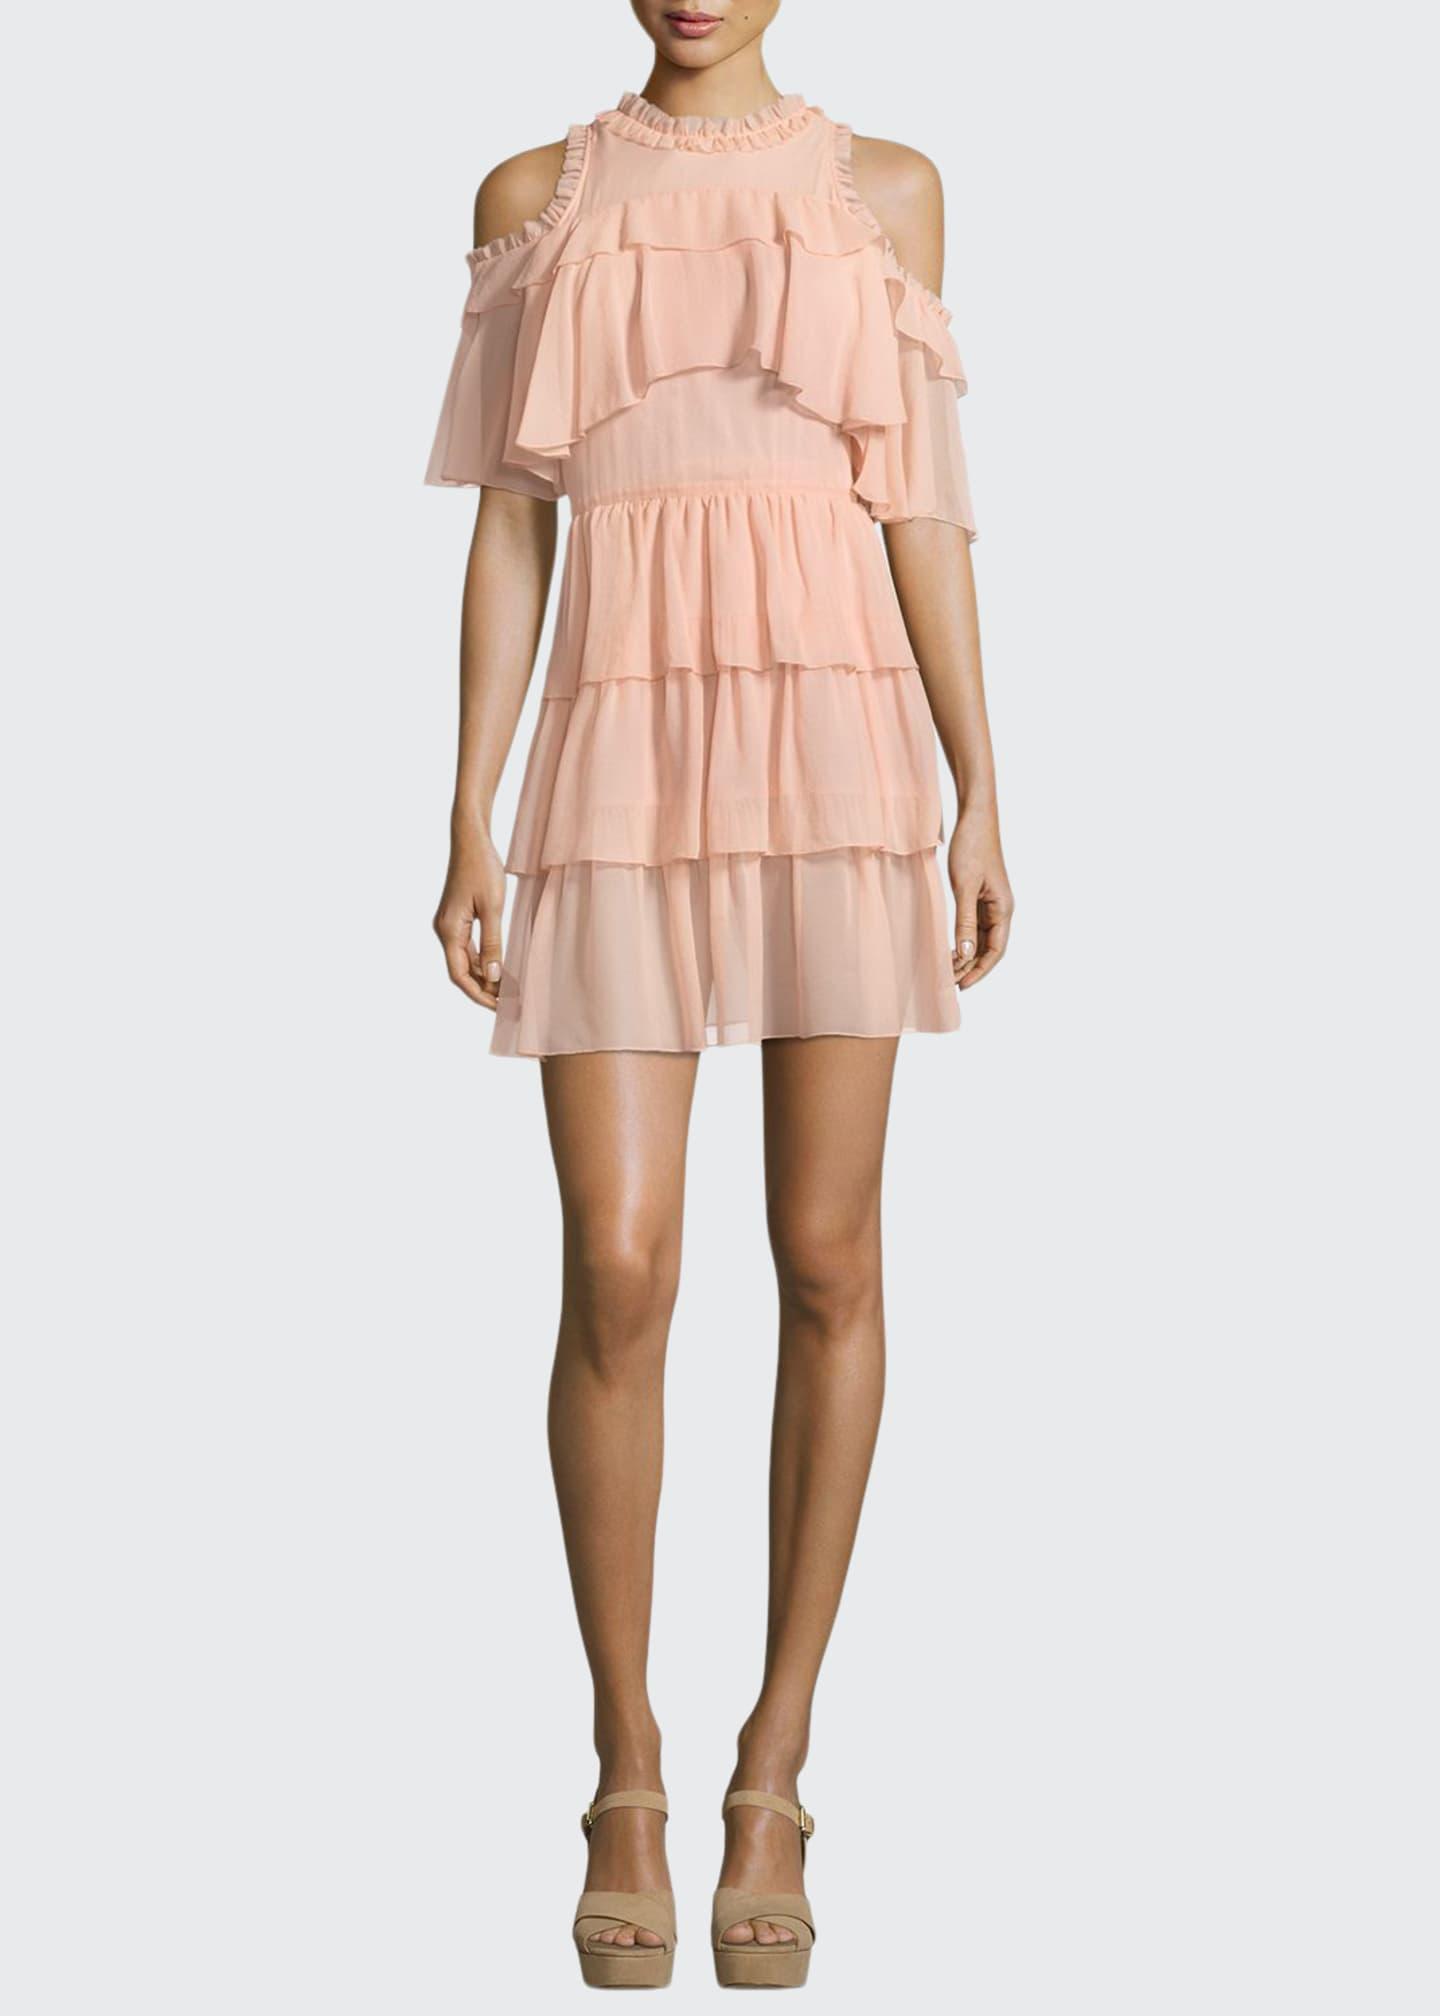 Alice + Olivia Nichola Cold-Shoulder Ruffle Party Dress